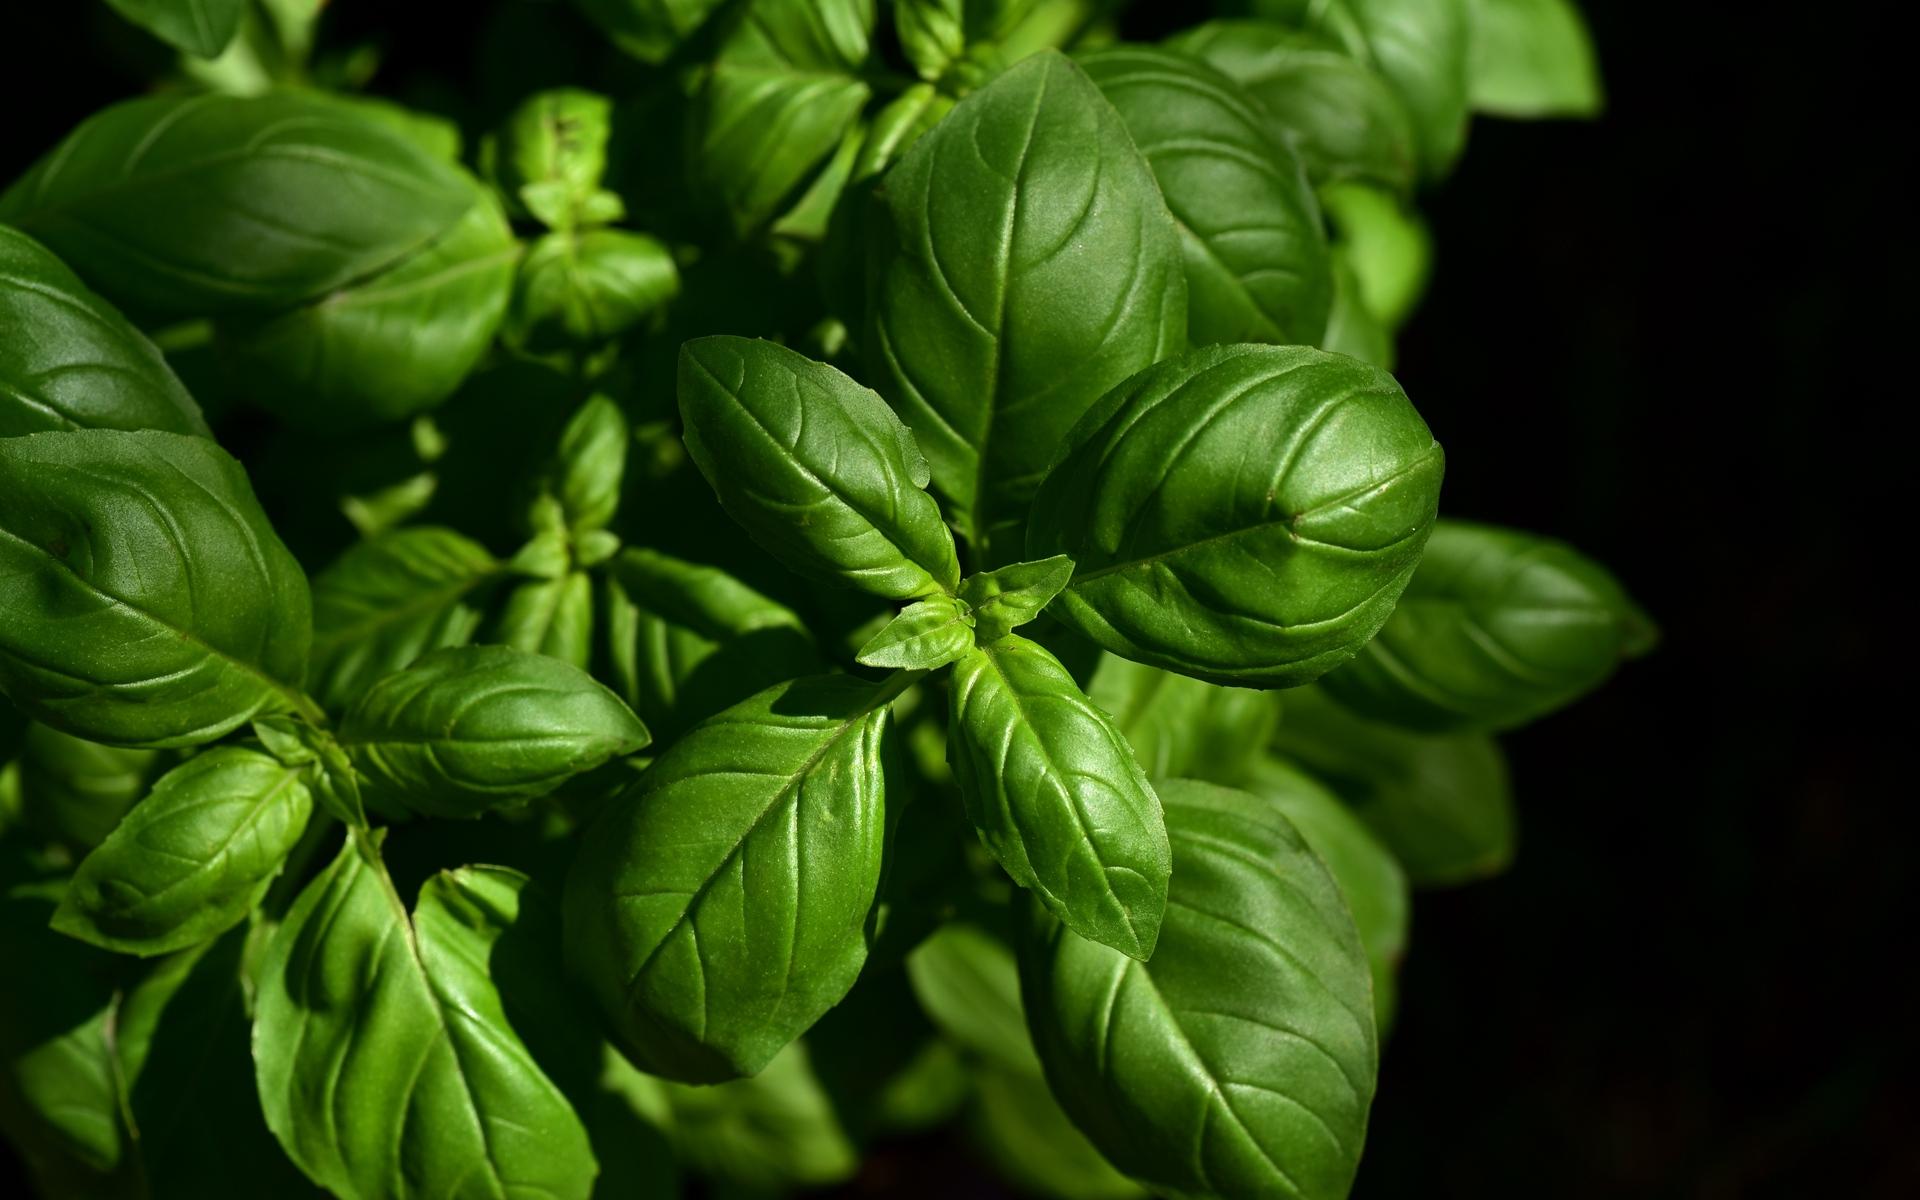 Download wallpaper 1920x1200 basil leaves green plant 1920x1200